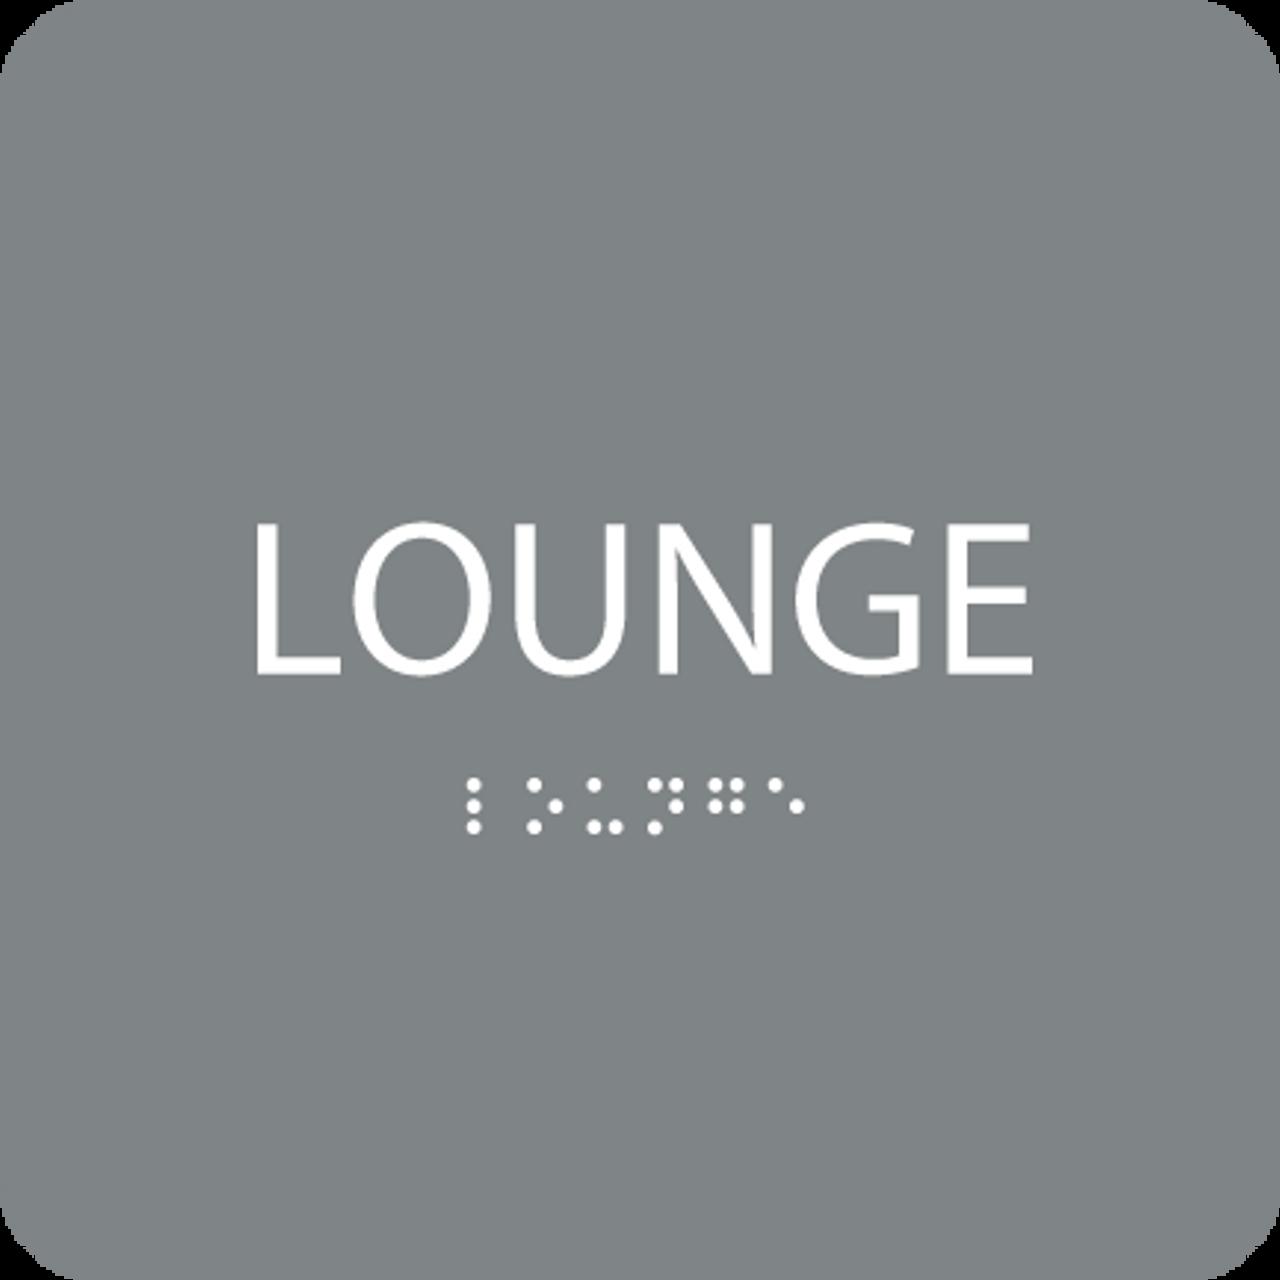 Grey  Lounge ADA Sign